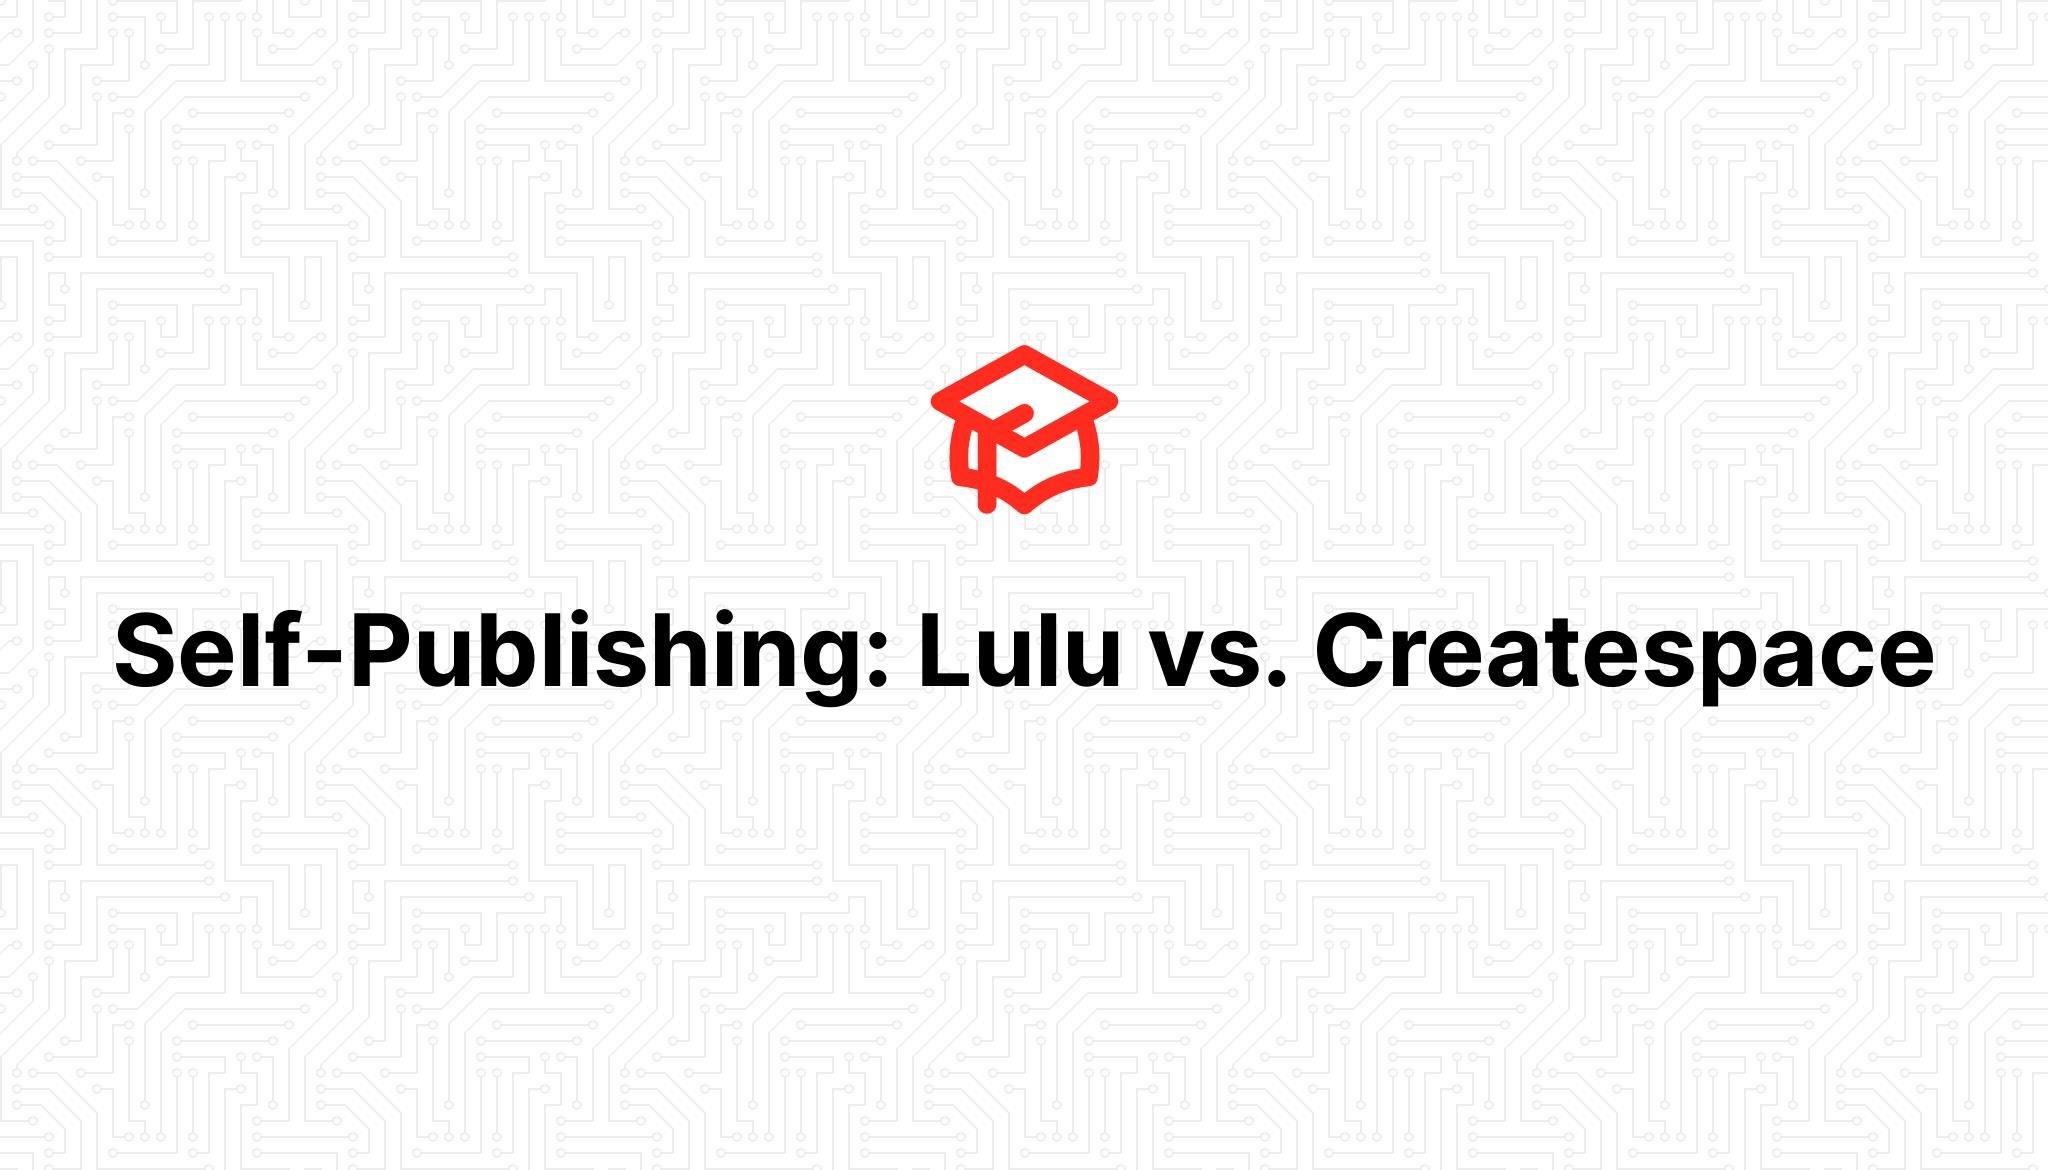 Self-Publishing: Lulu vs. Createspace